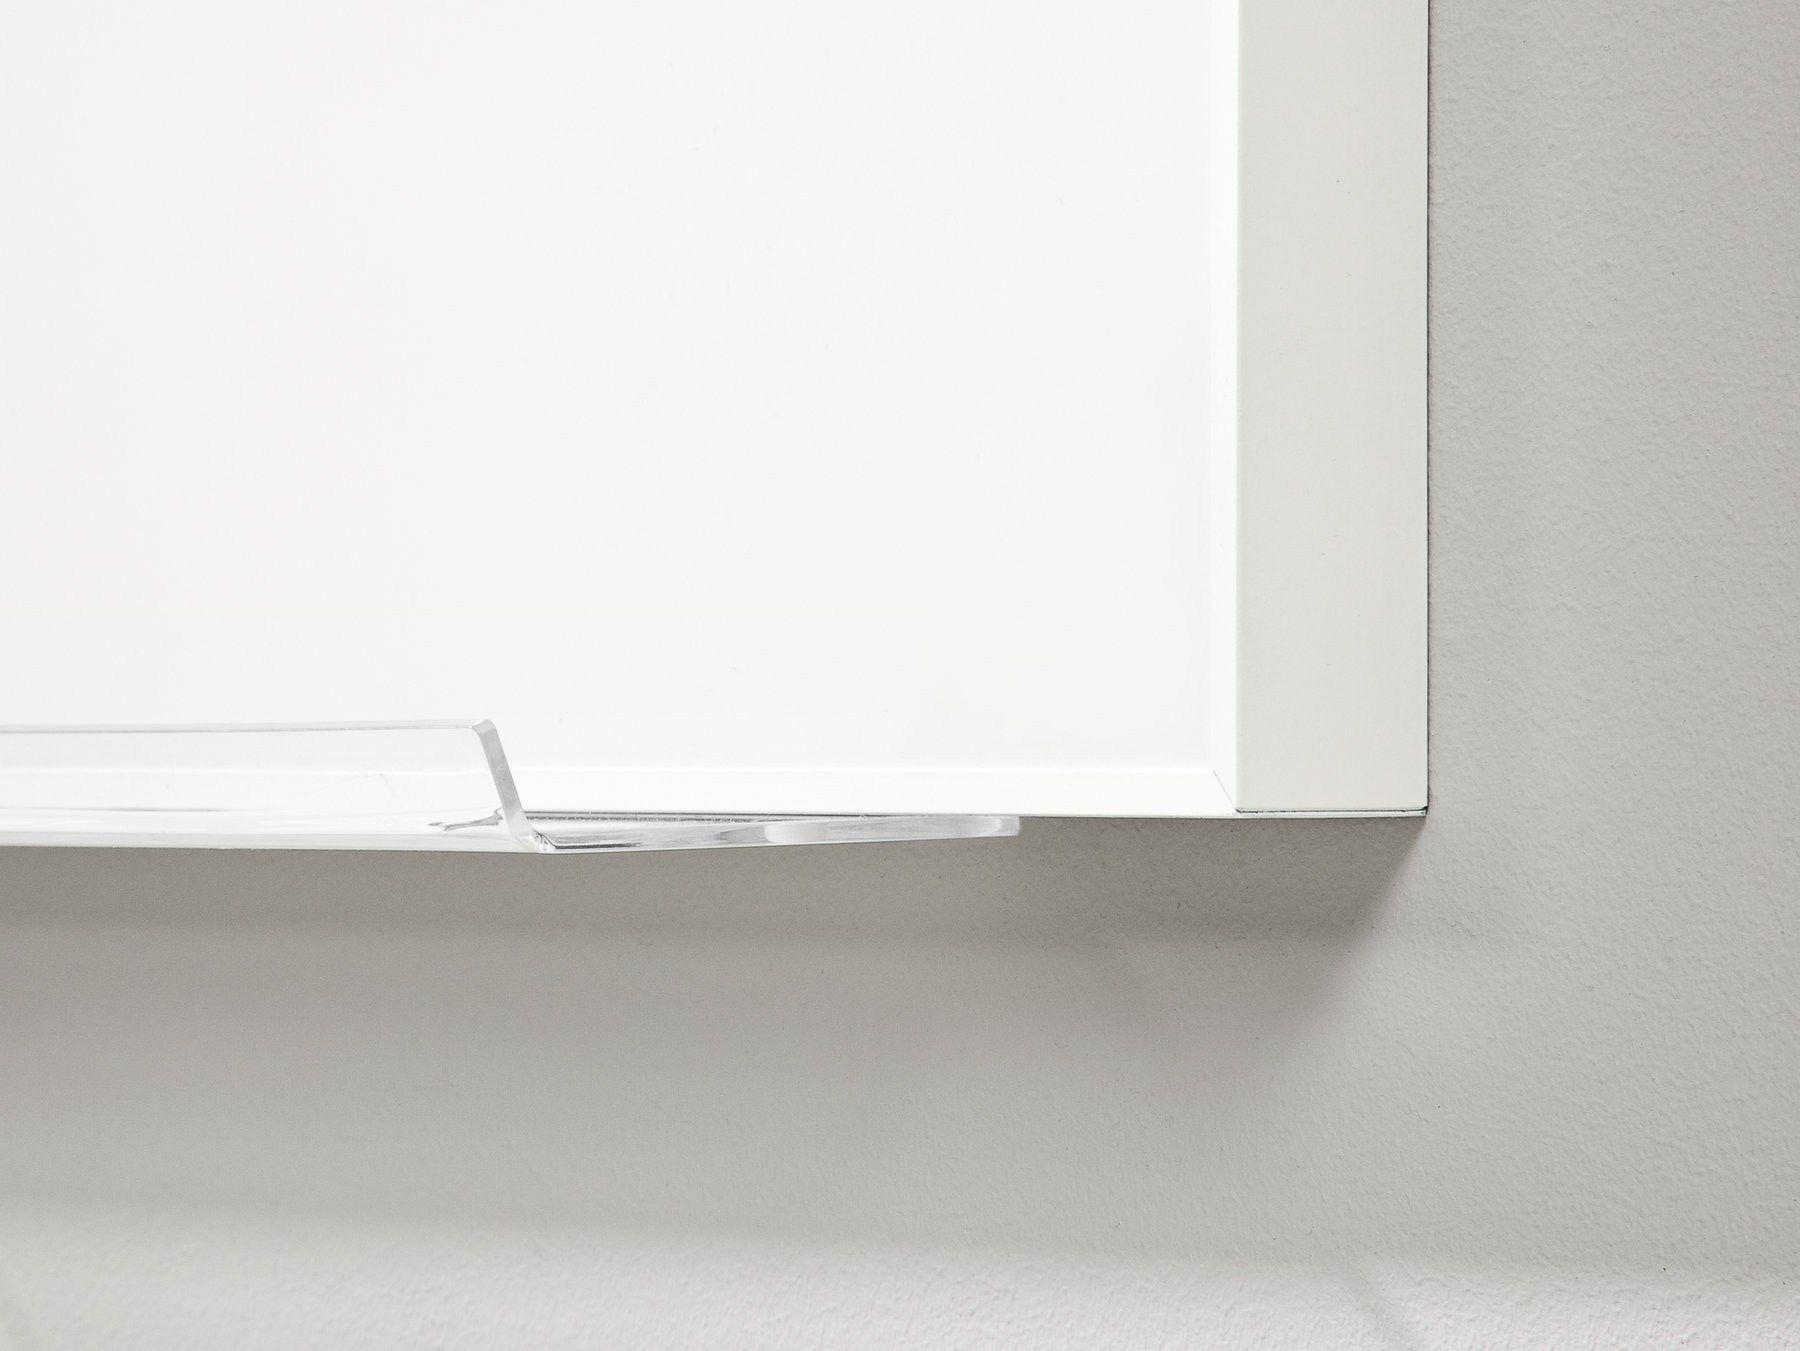 Tableau blanc mural deep whiteboard by lintex - Tableau blanc mural ...